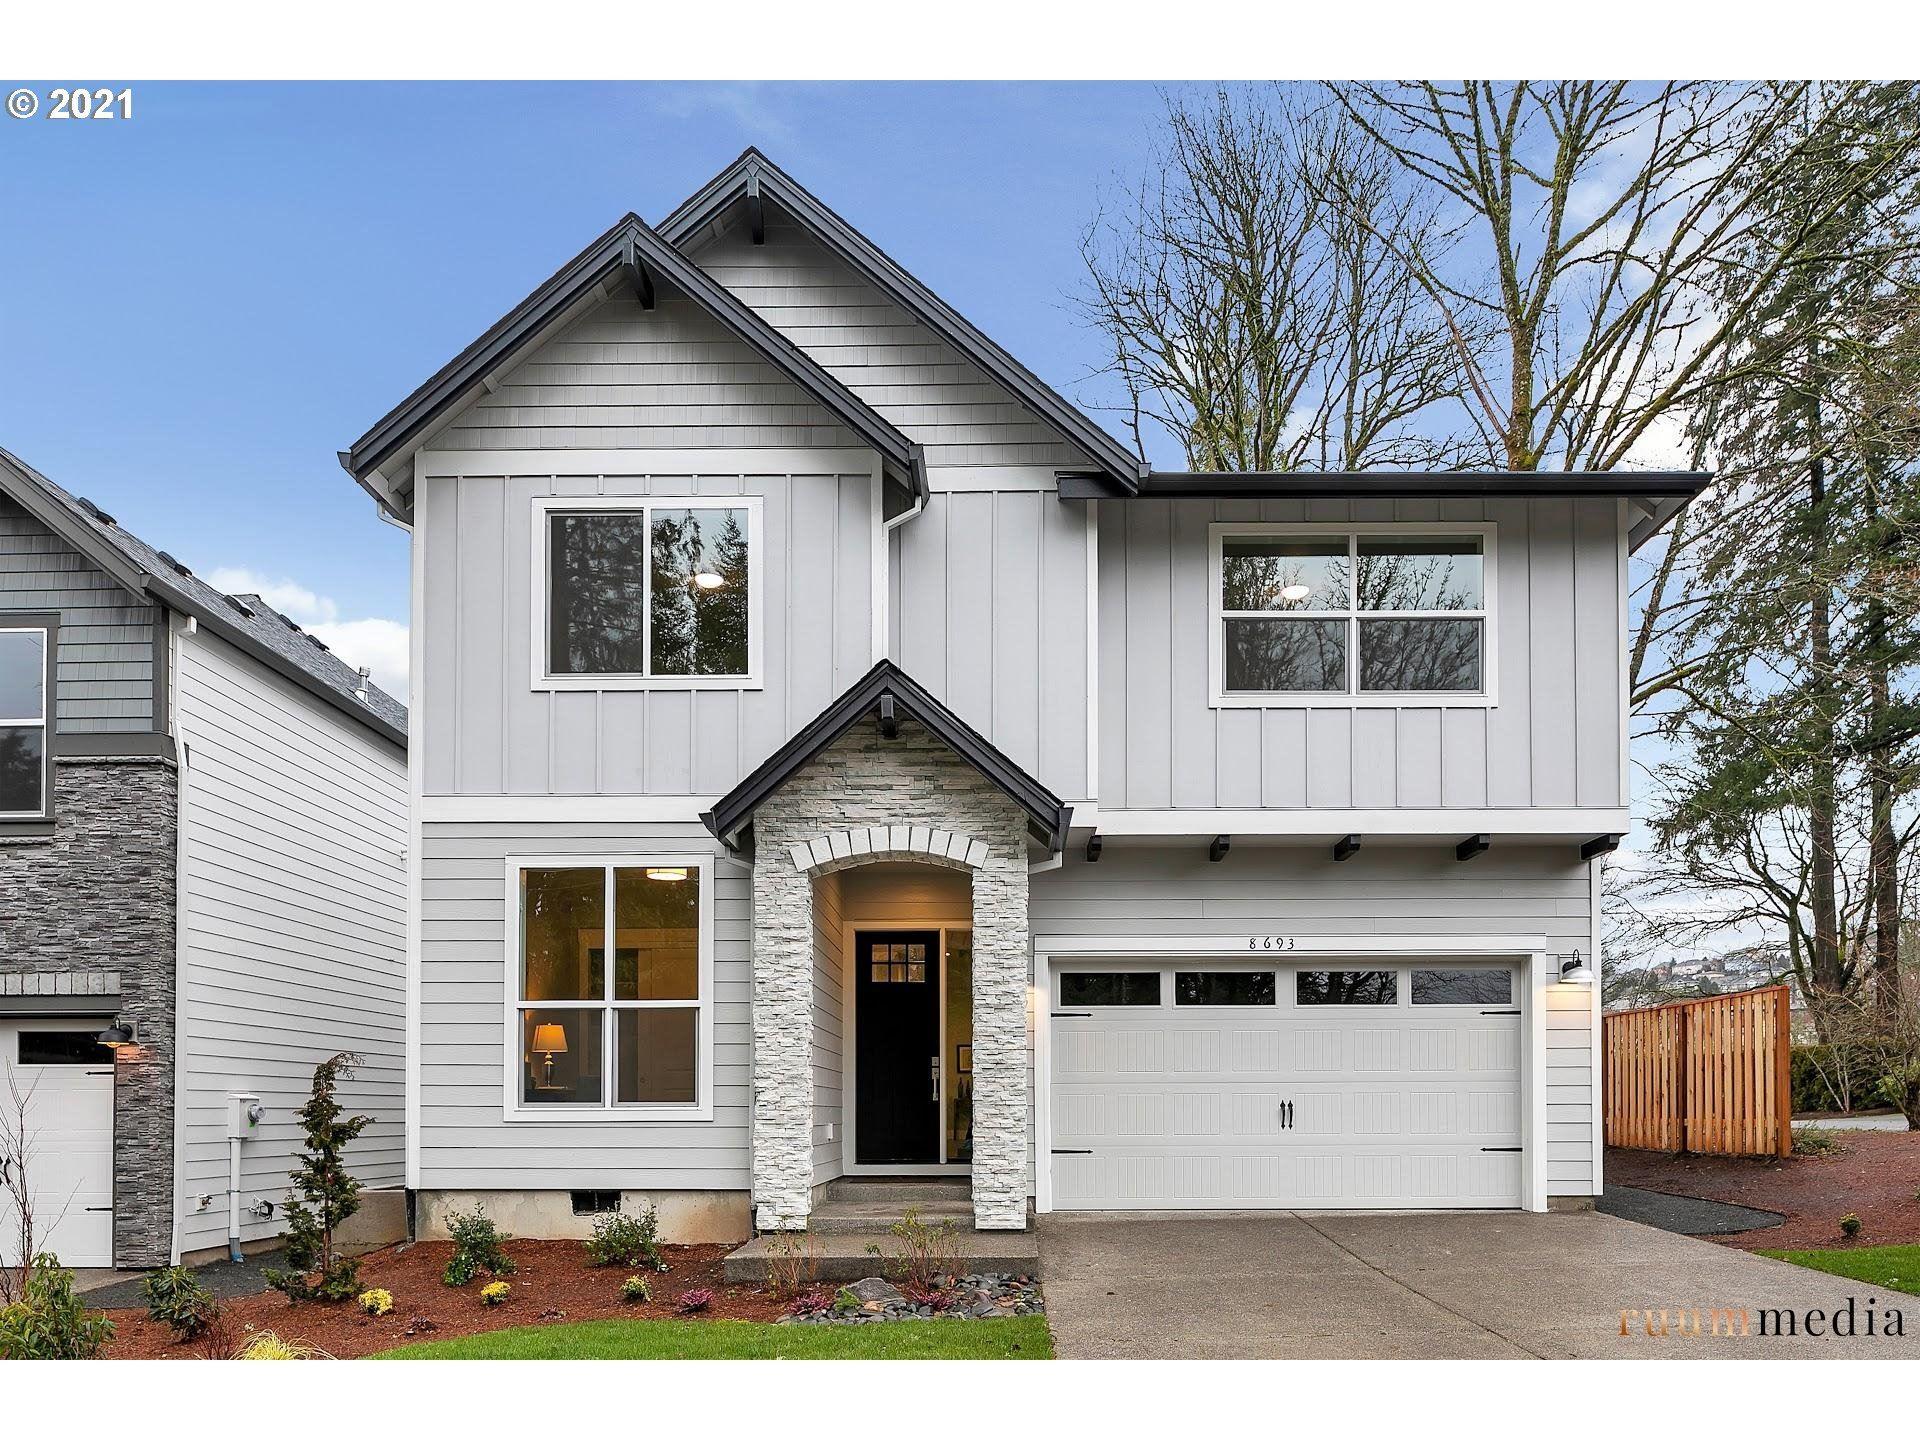 11031 NW Civil CT, Portland, OR 97229 - MLS#: 21430084